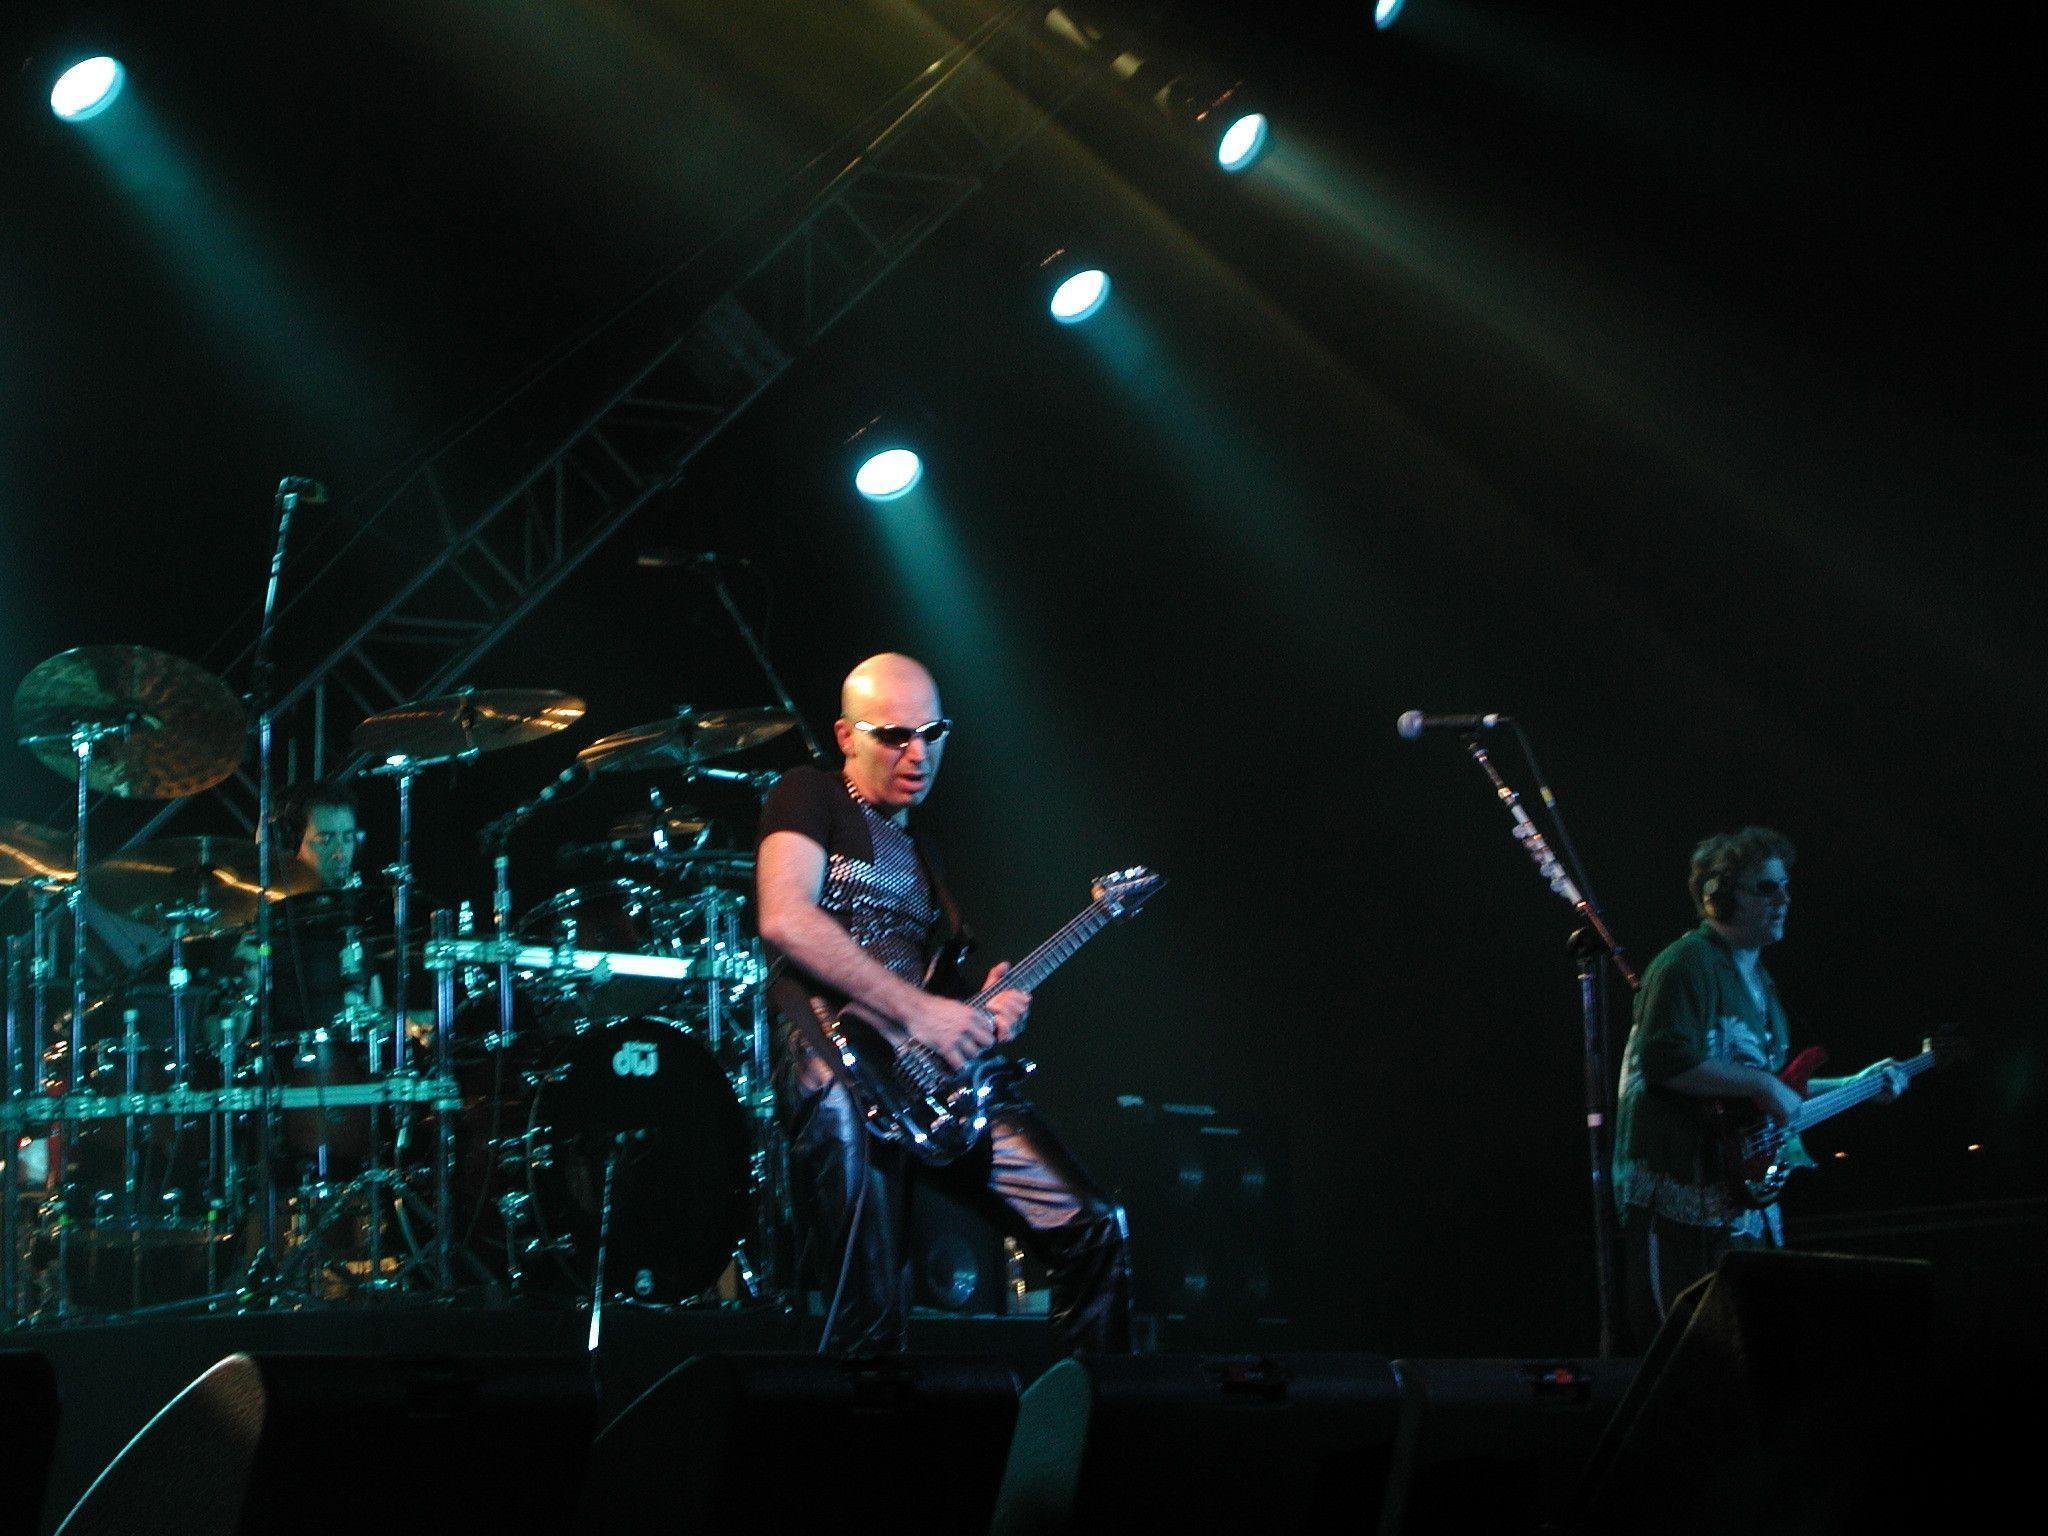 Joe Satriani Wallpapers 2048x1536